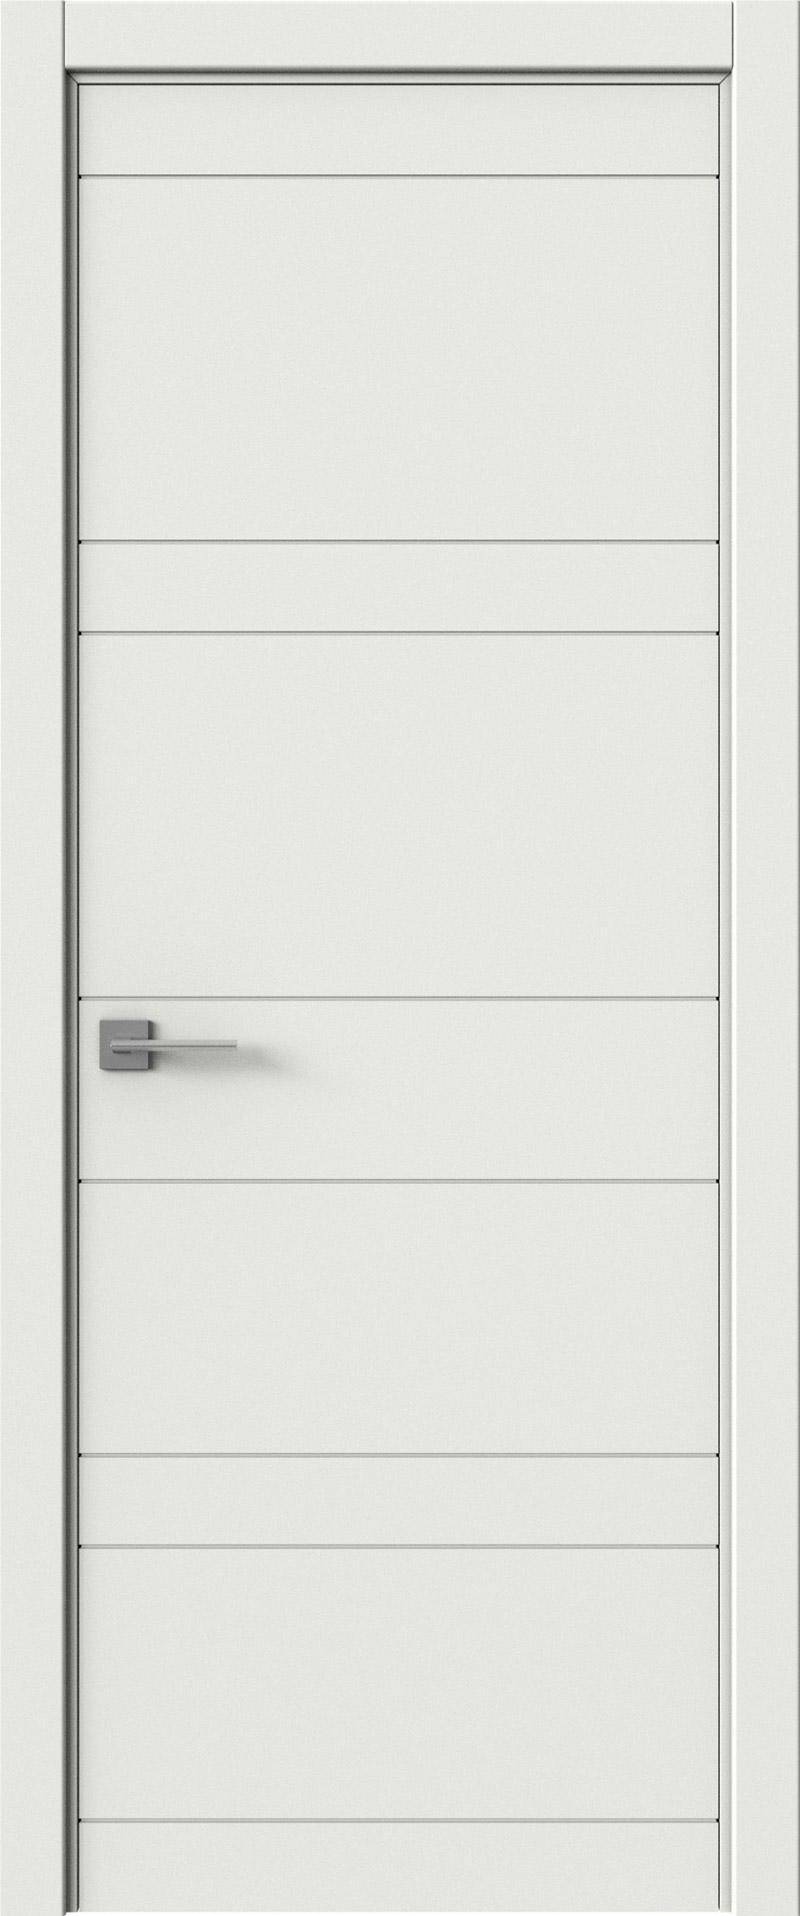 Tivoli Е-2 цвет - Белая эмаль (RAL 9003) Без стекла (ДГ)